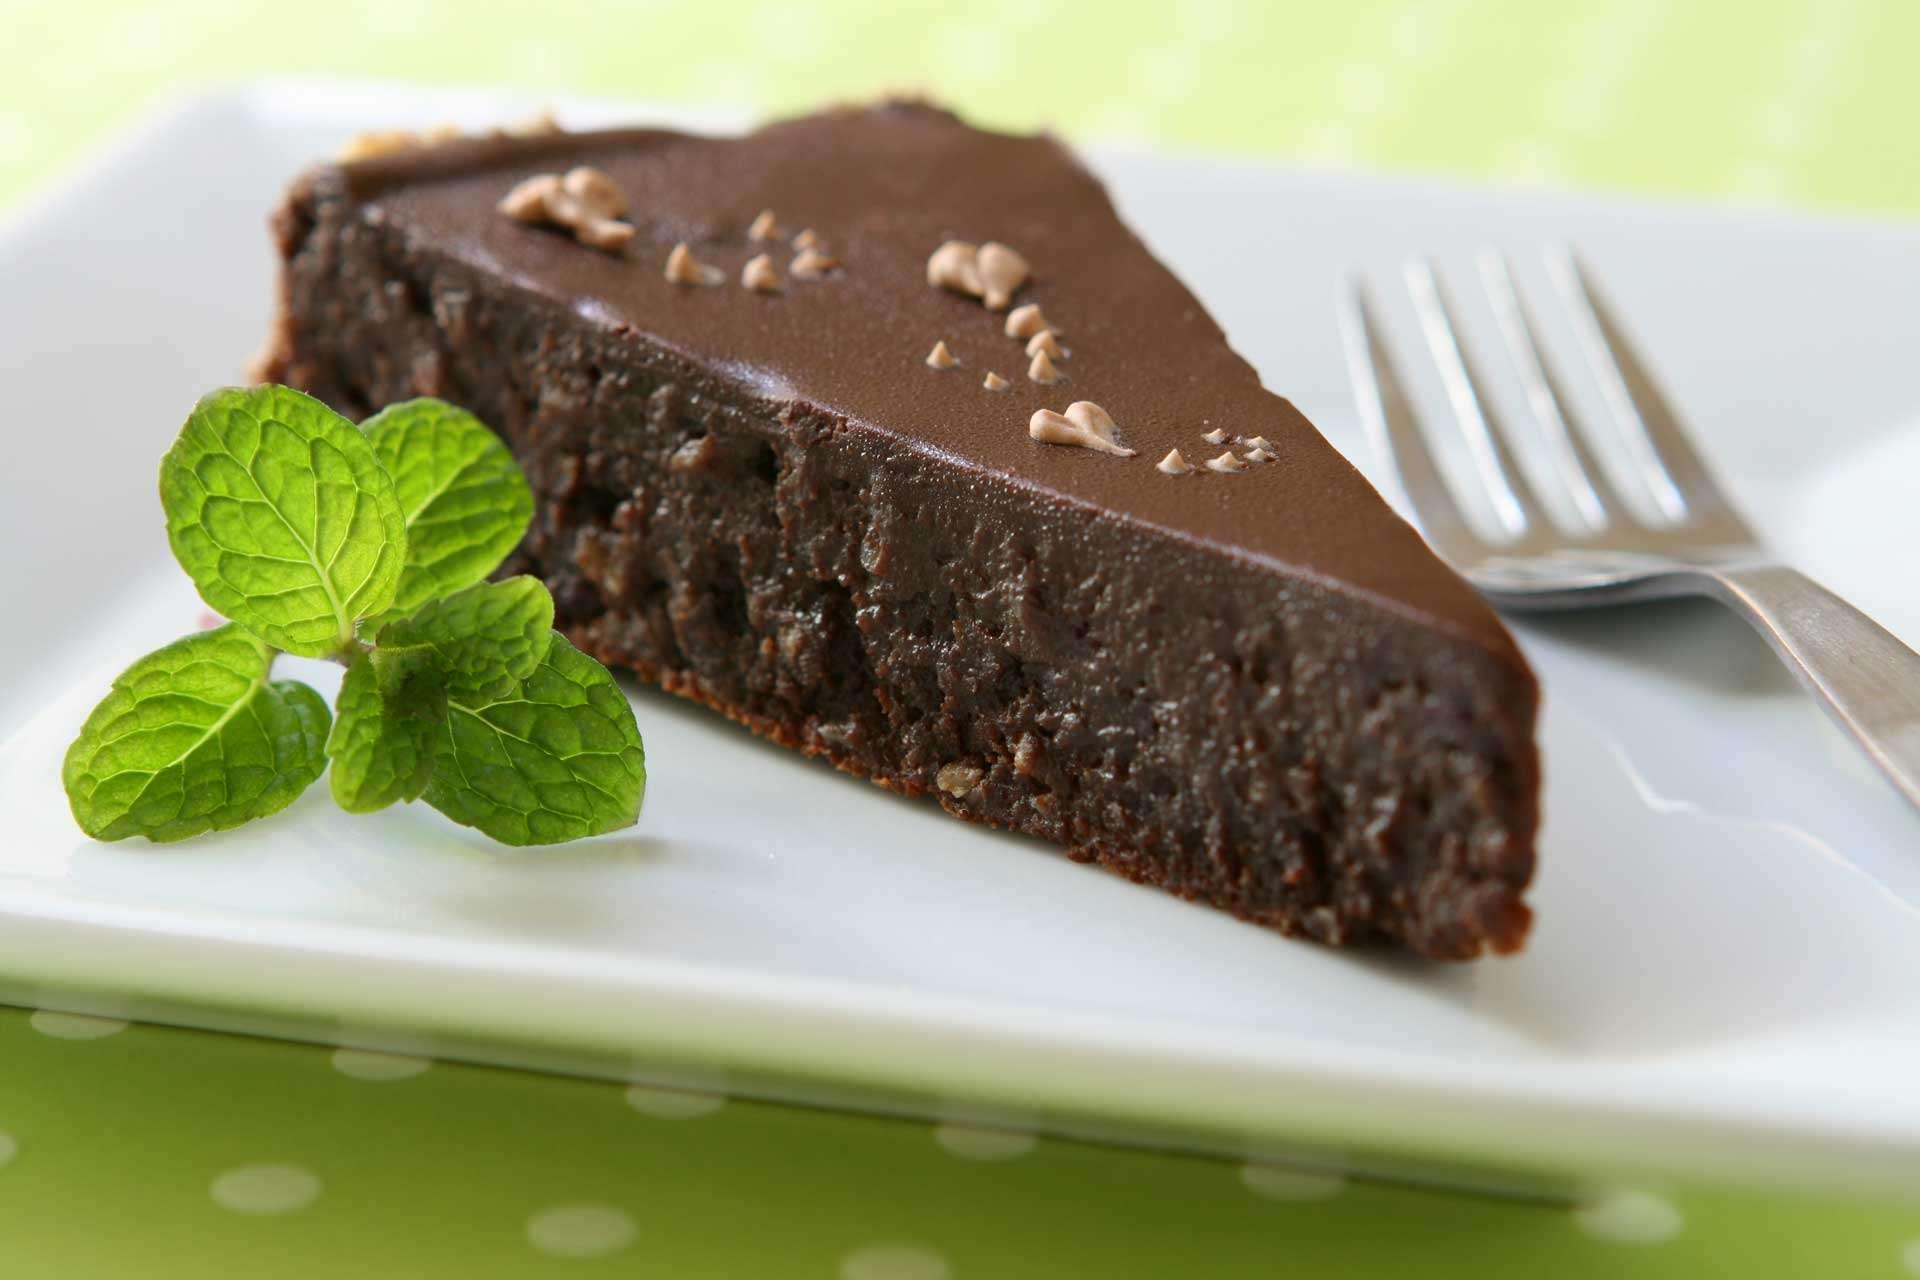 Maria's Flourless Chocolate Cake